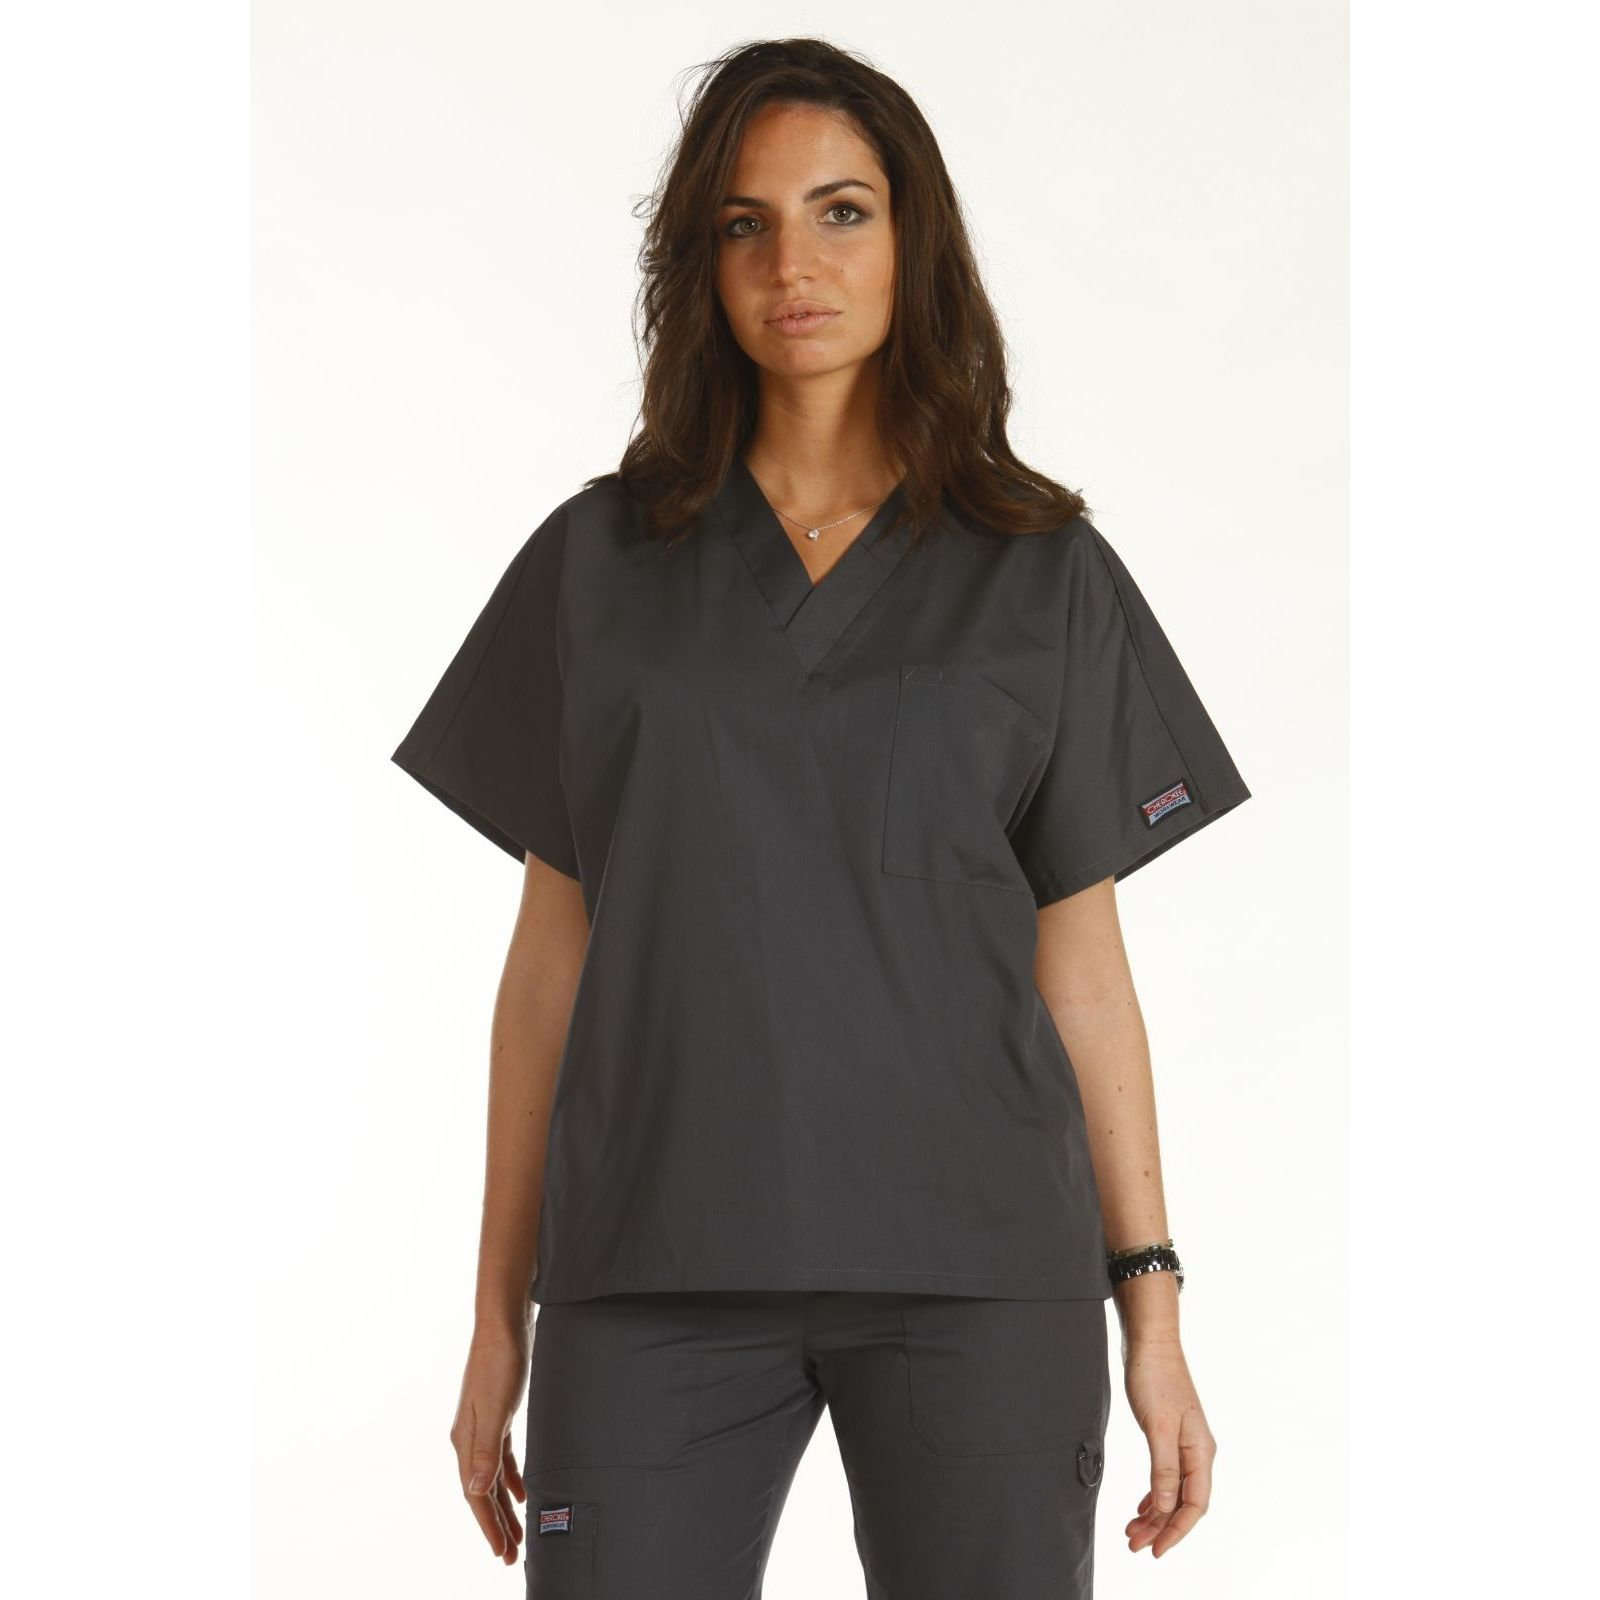 Blouse médicale Femme, 1 poche, Cherokee Workwear Originals (4777) gris modele